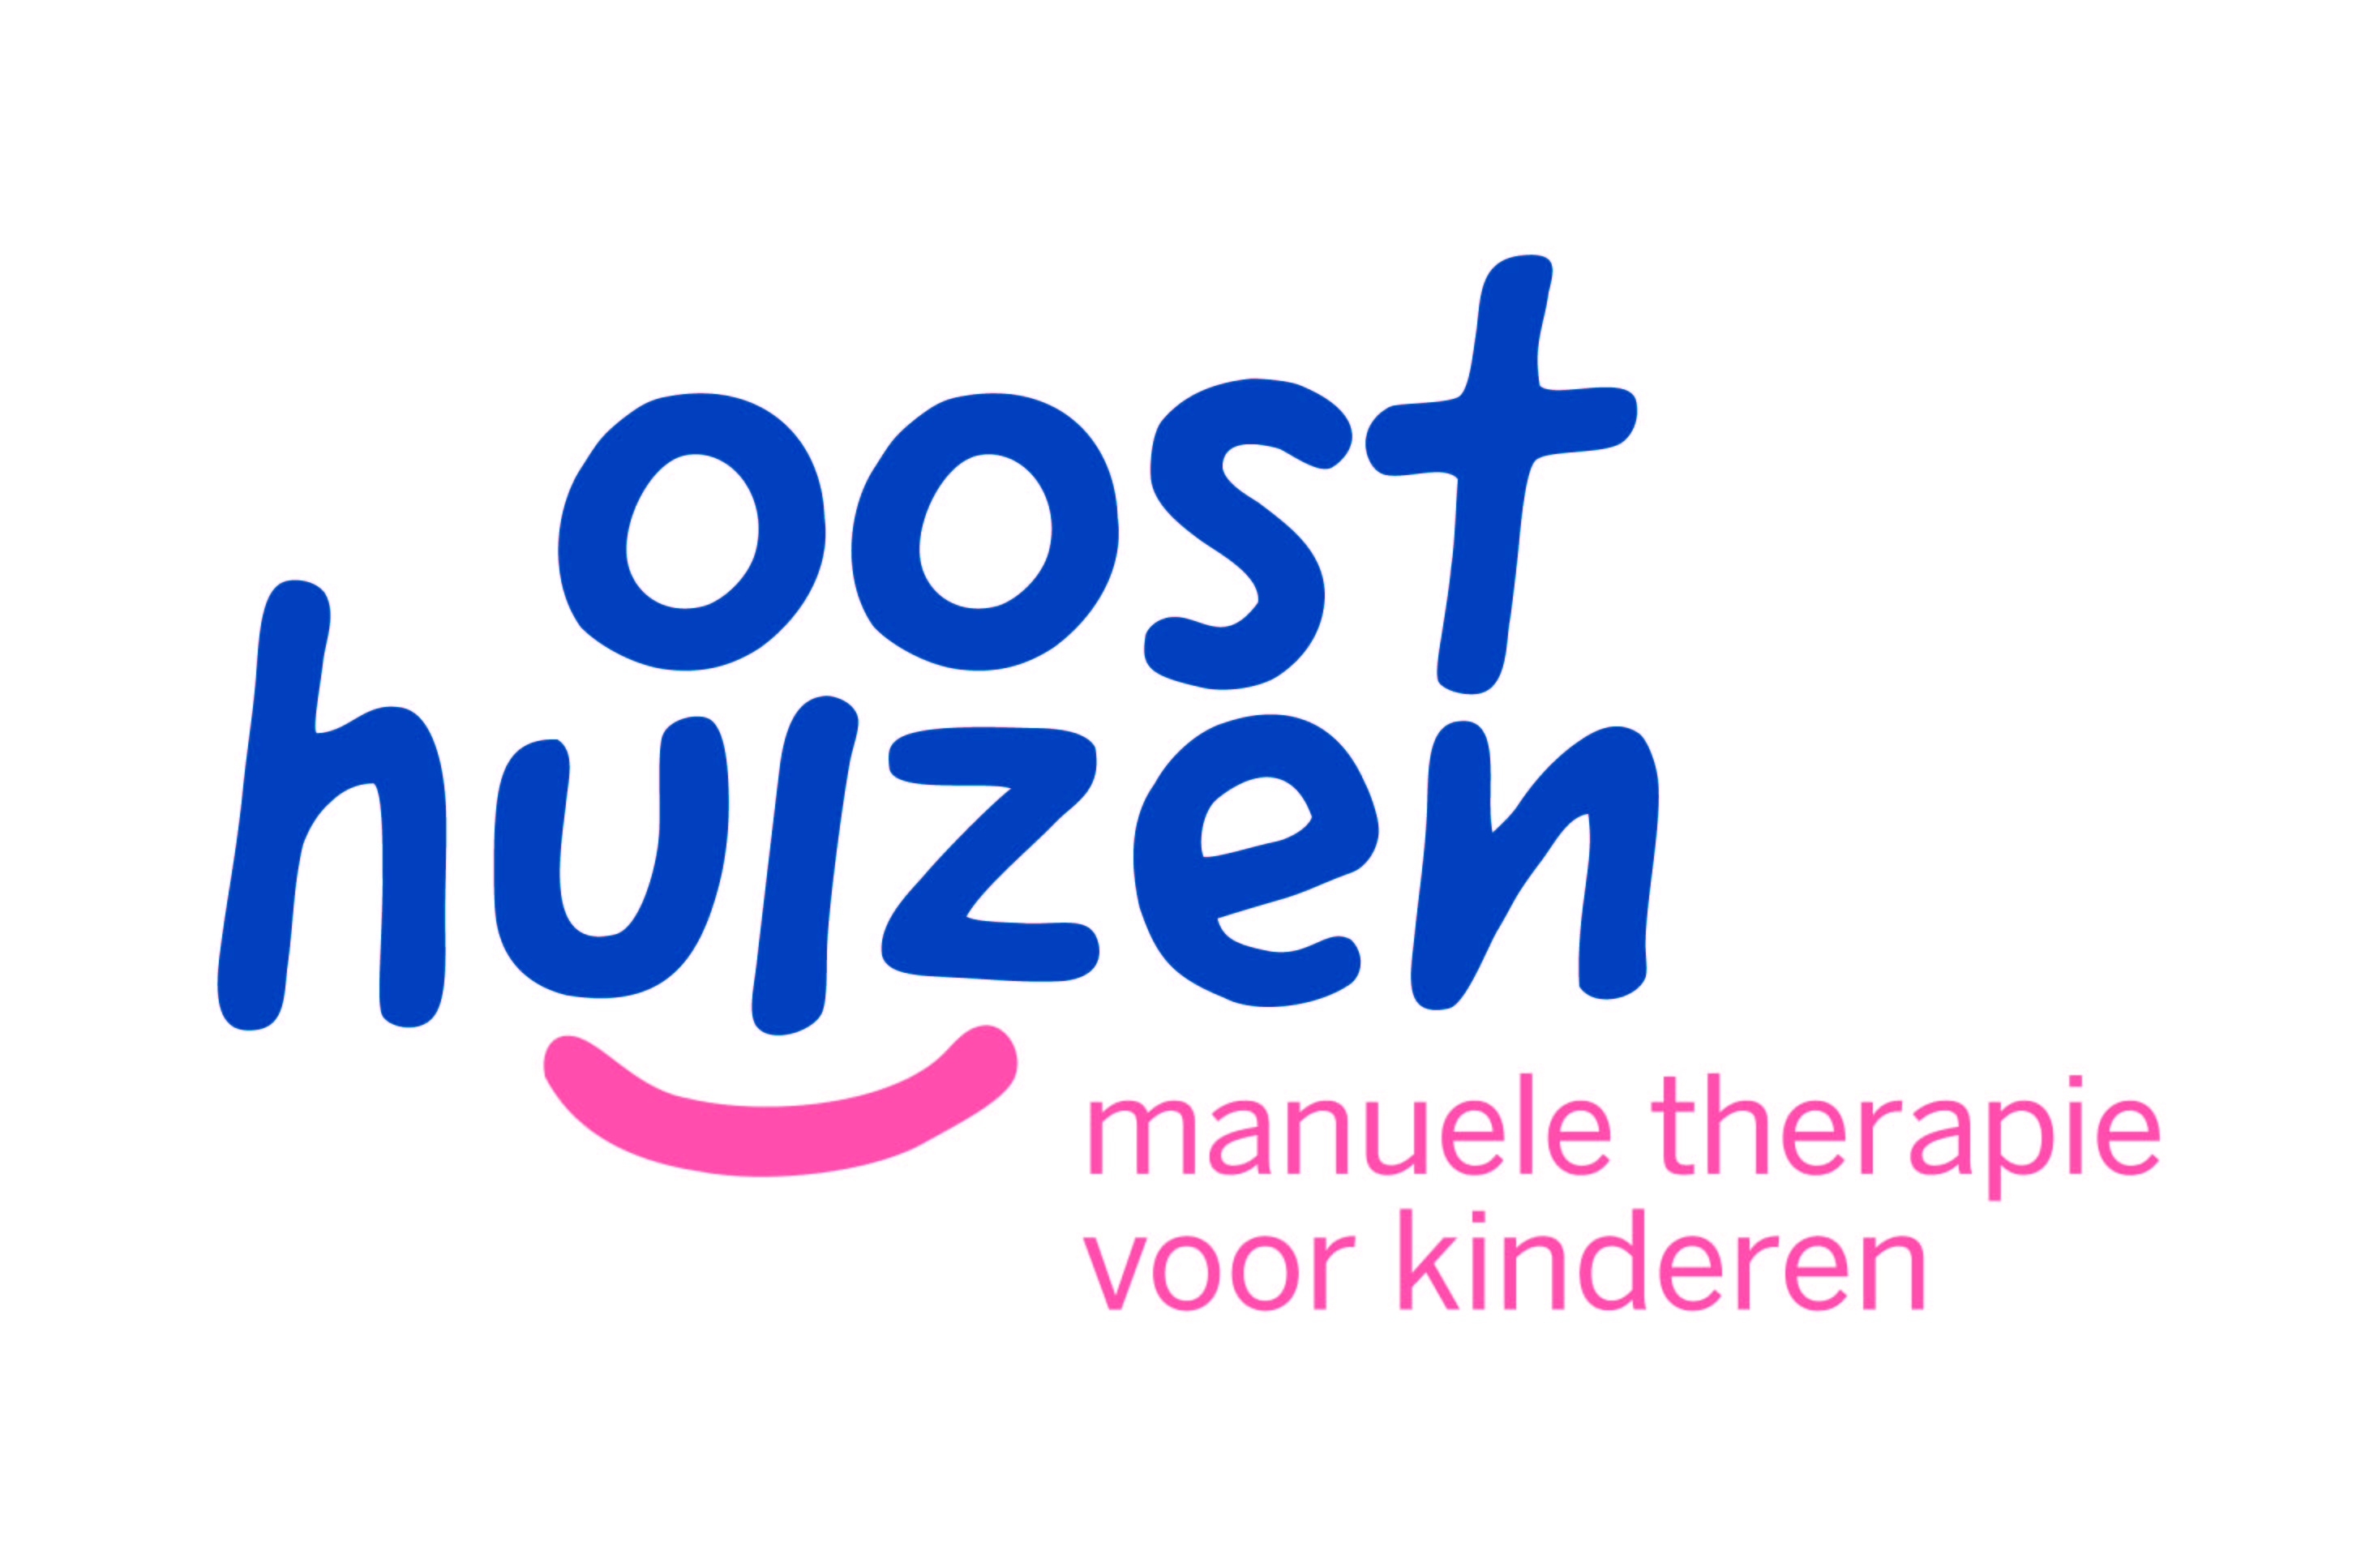 Manuele Therapie Oosthuizen